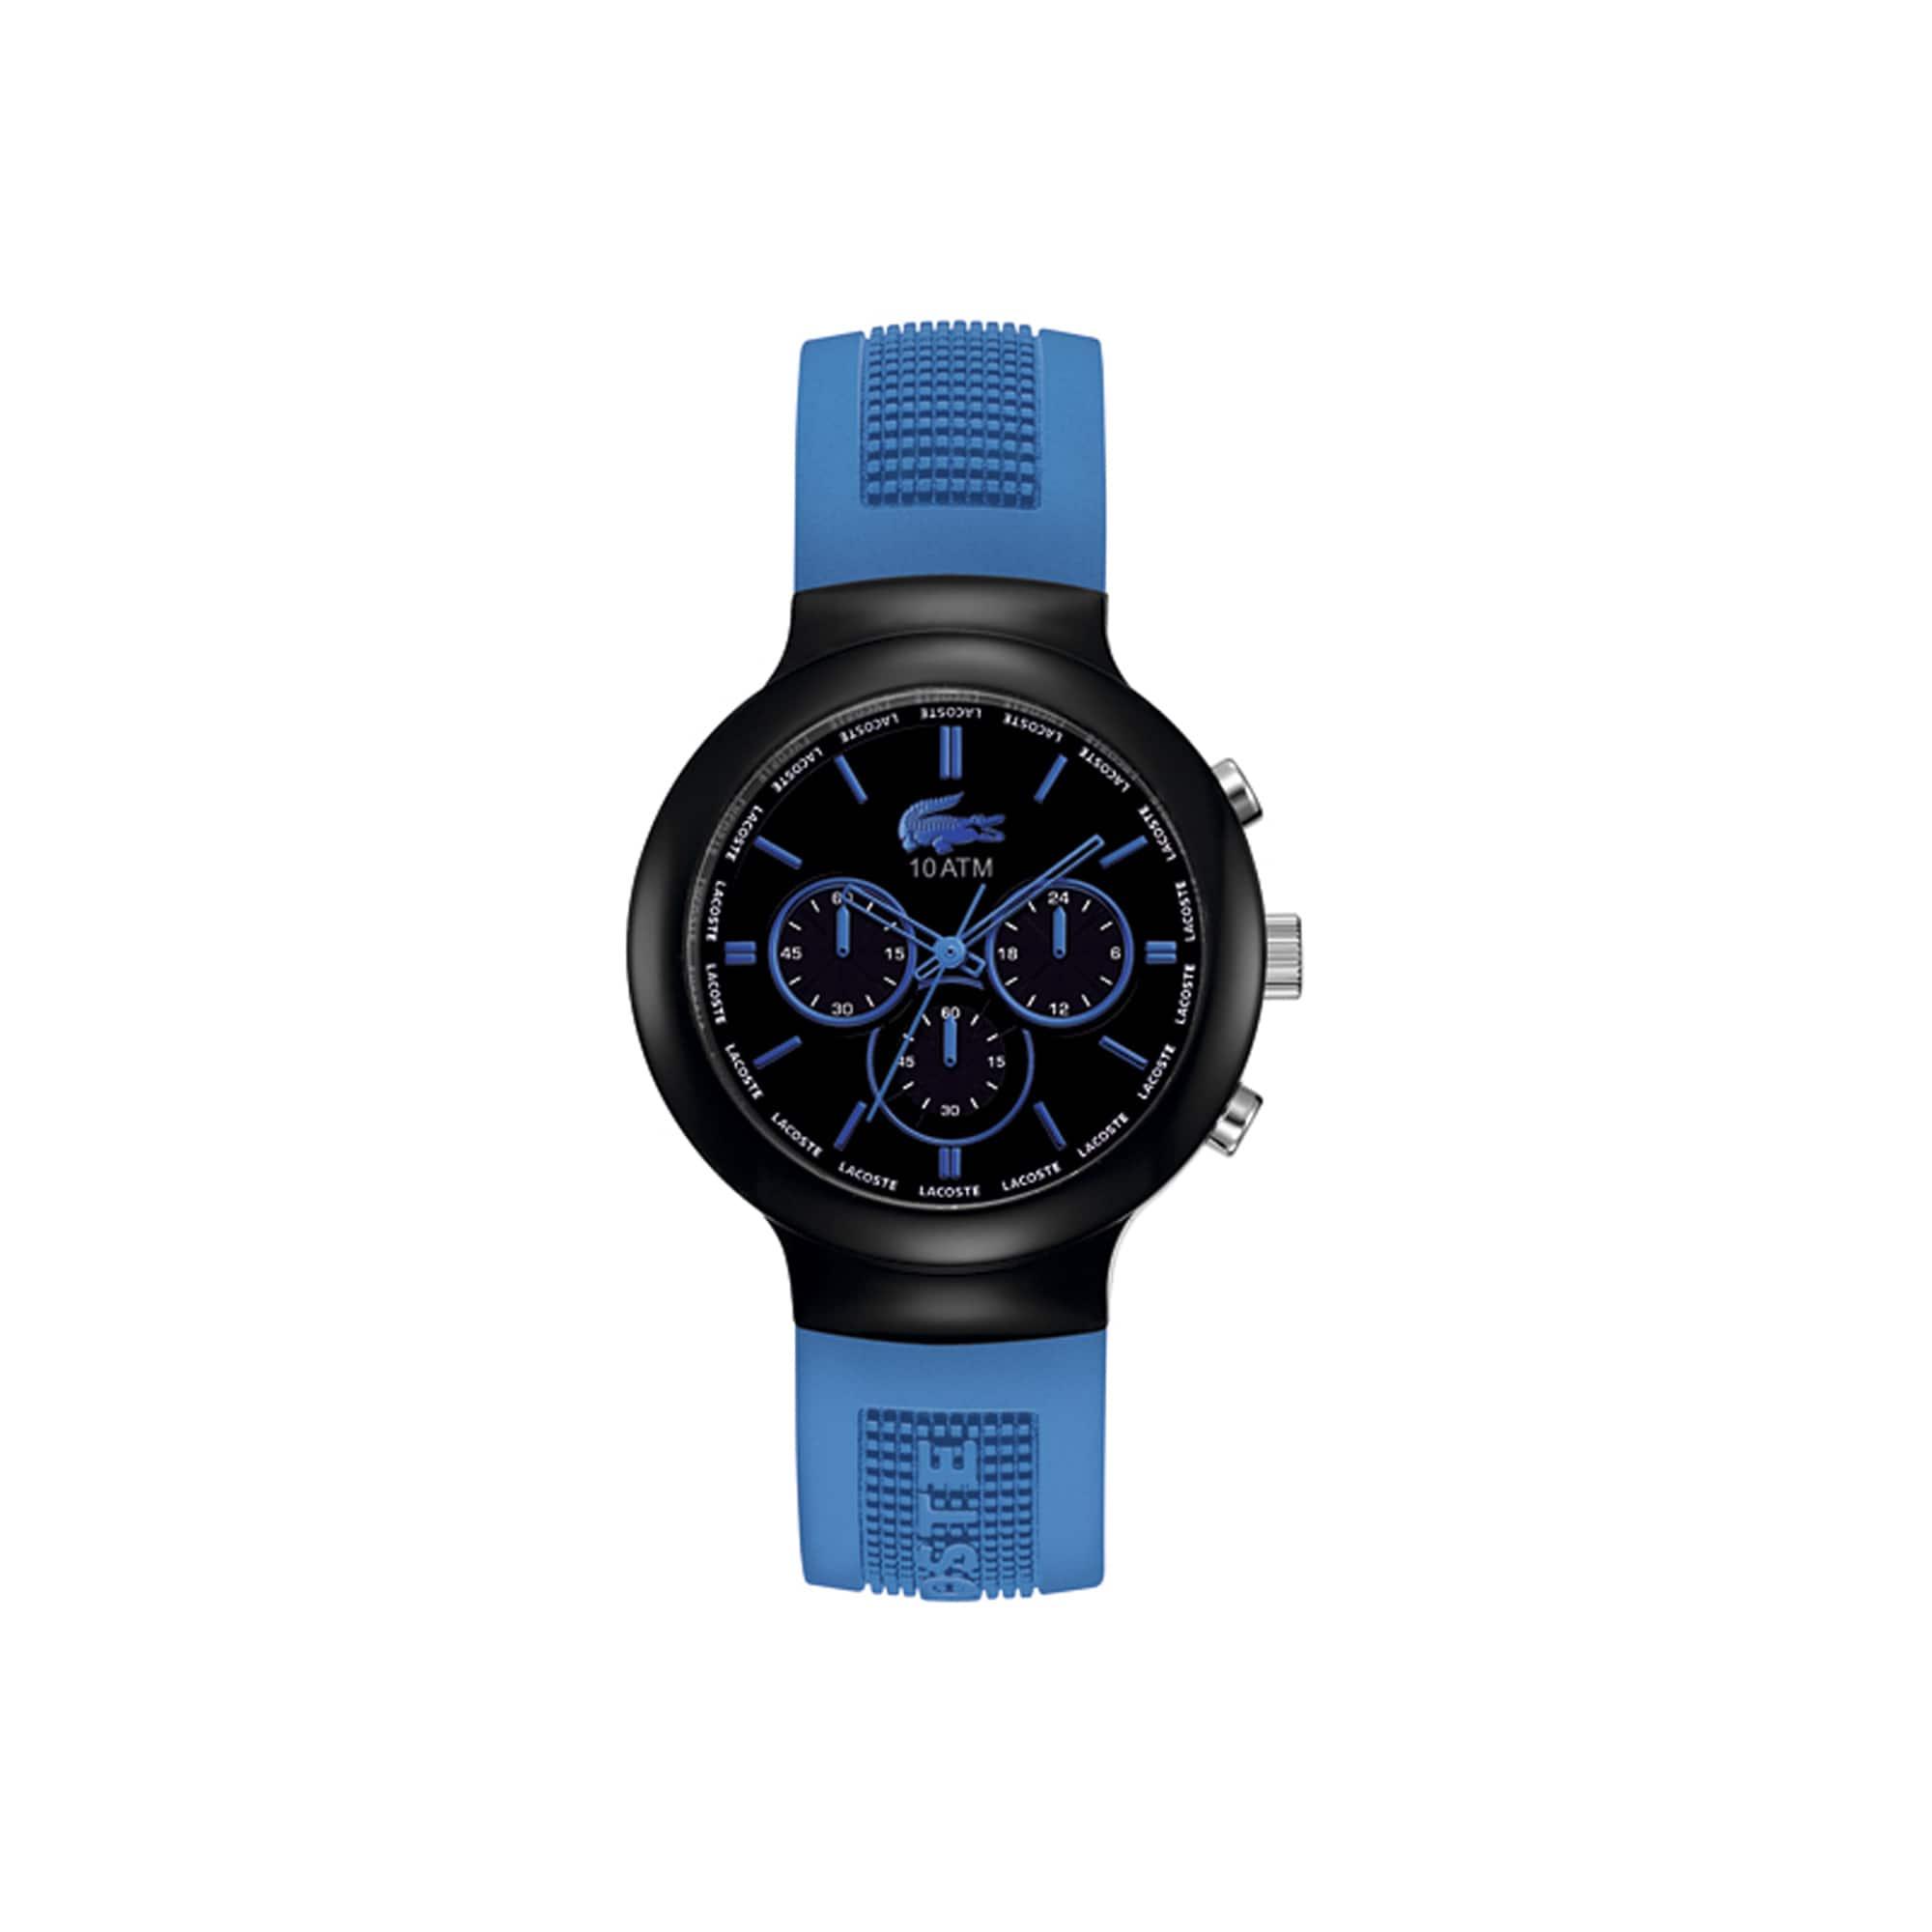 Montre Borneo chrono - bracelet bleu